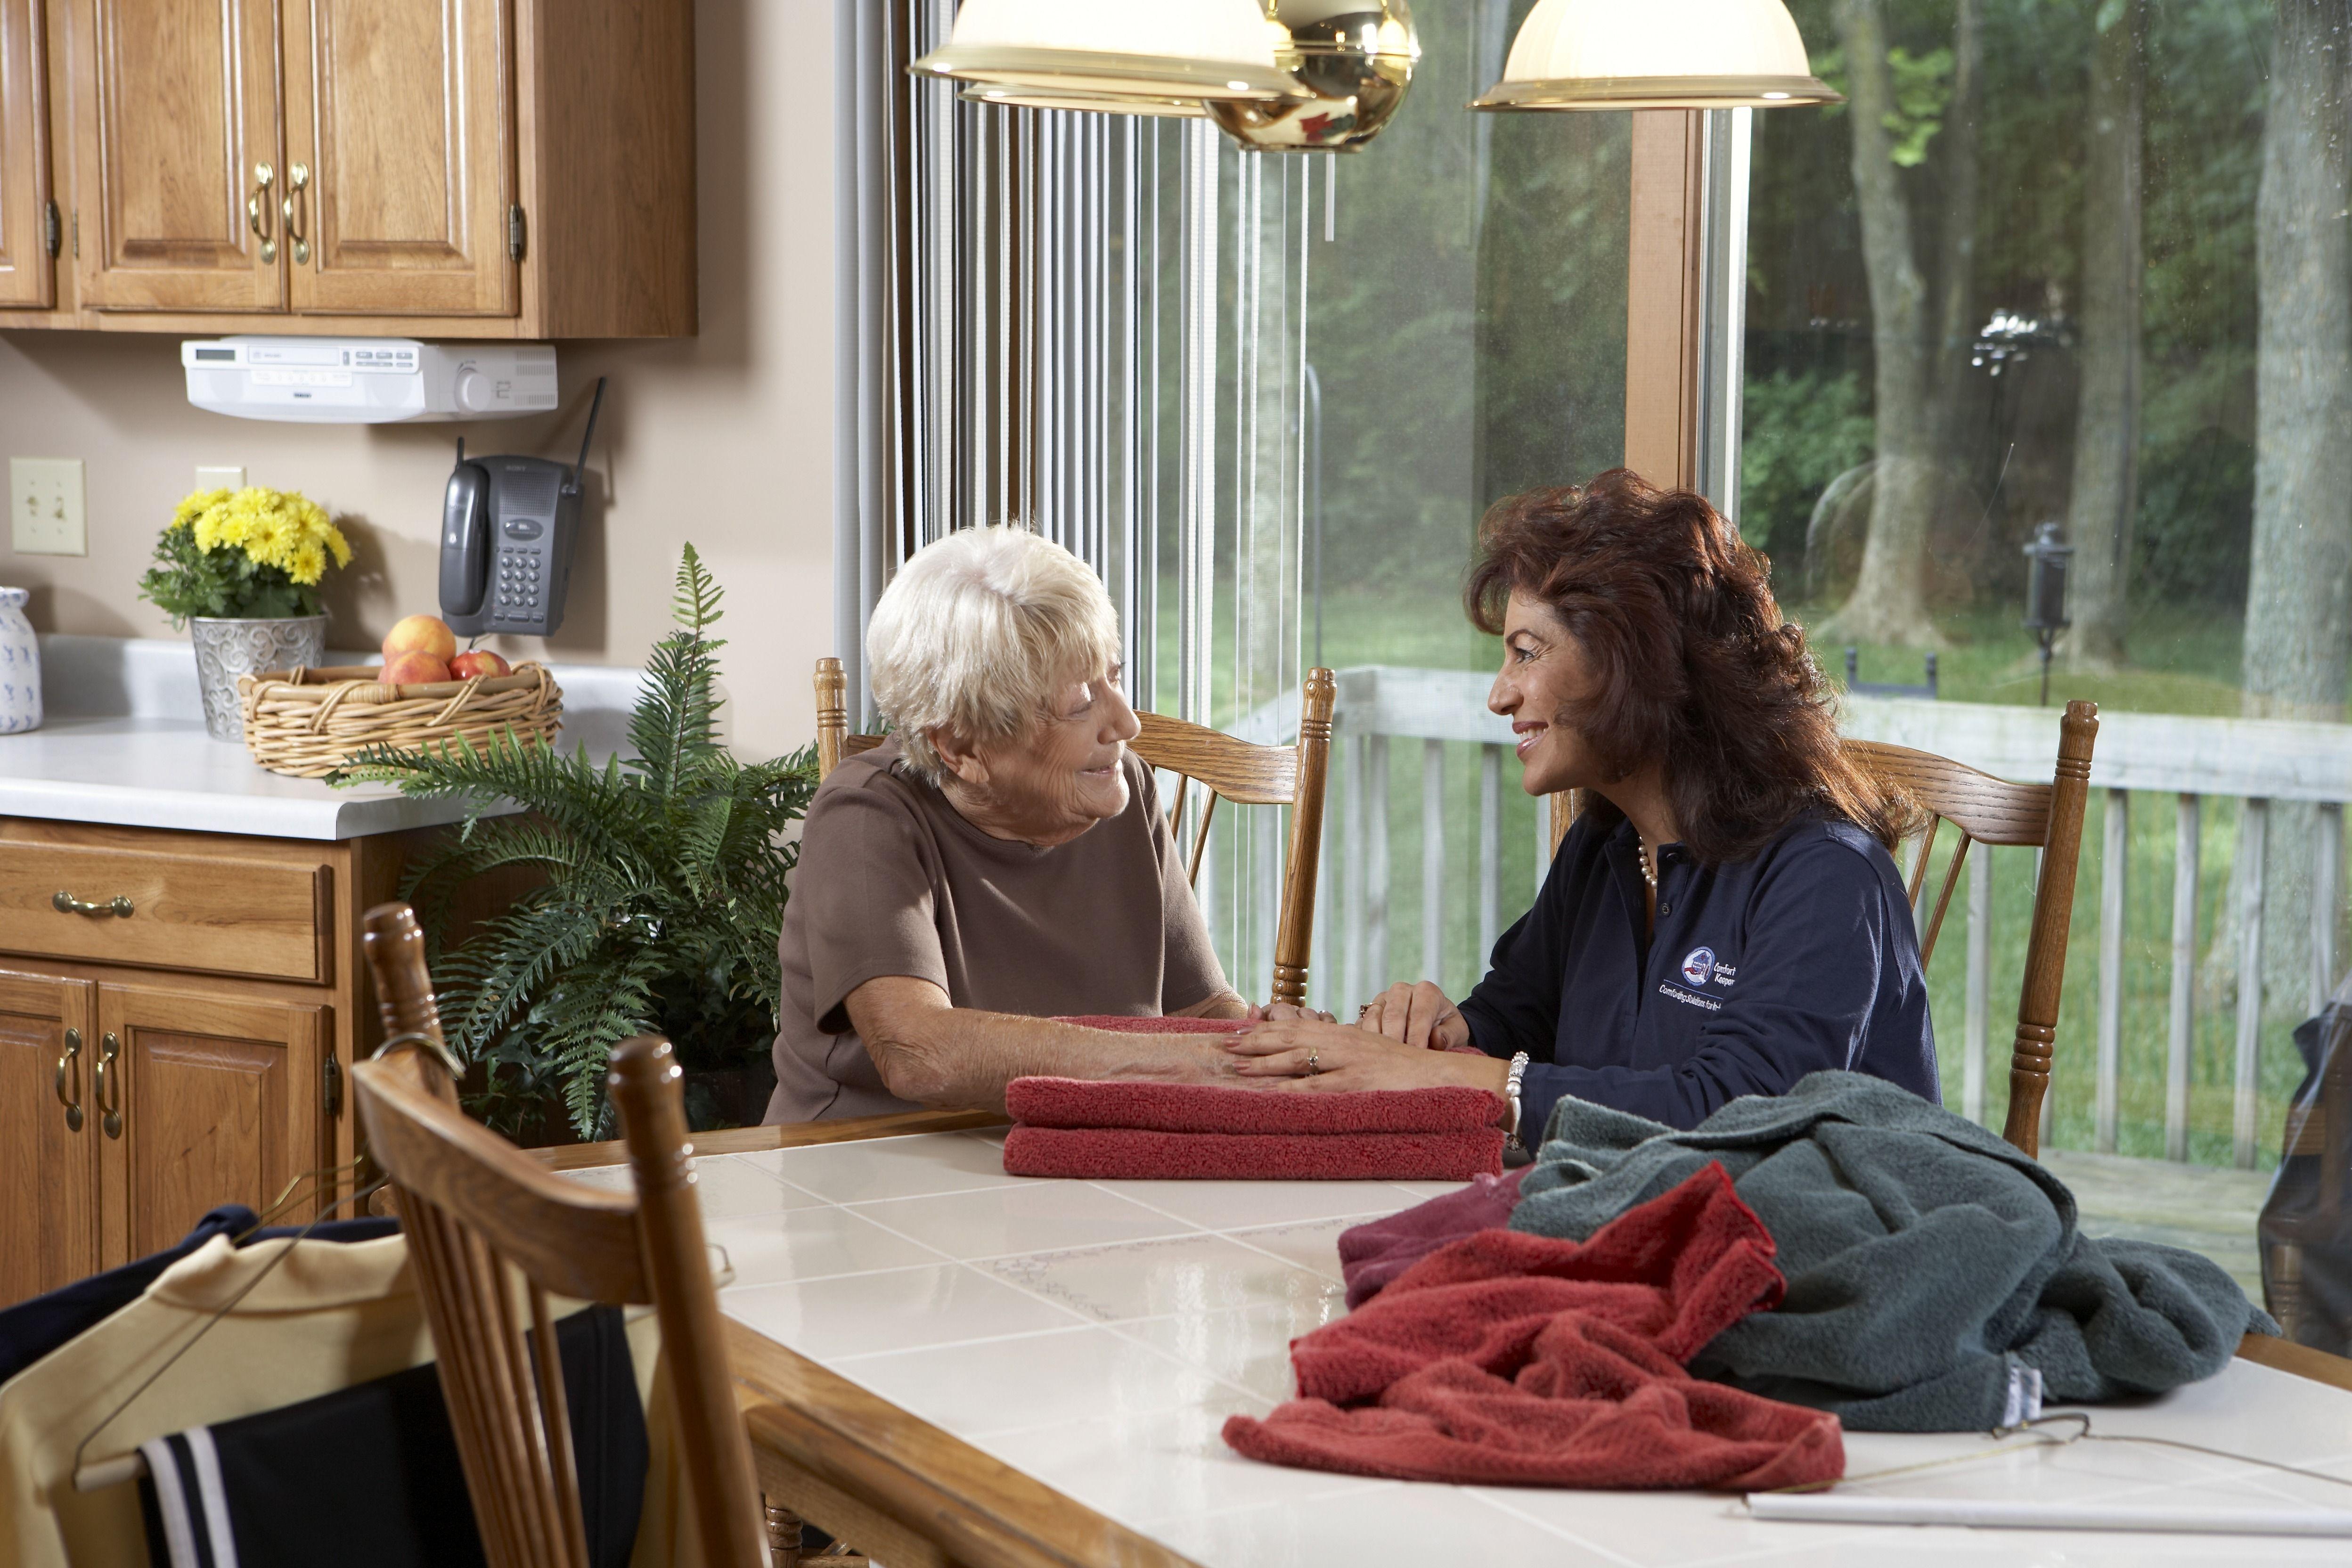 Home safety for seniors. inhomecare eldercare